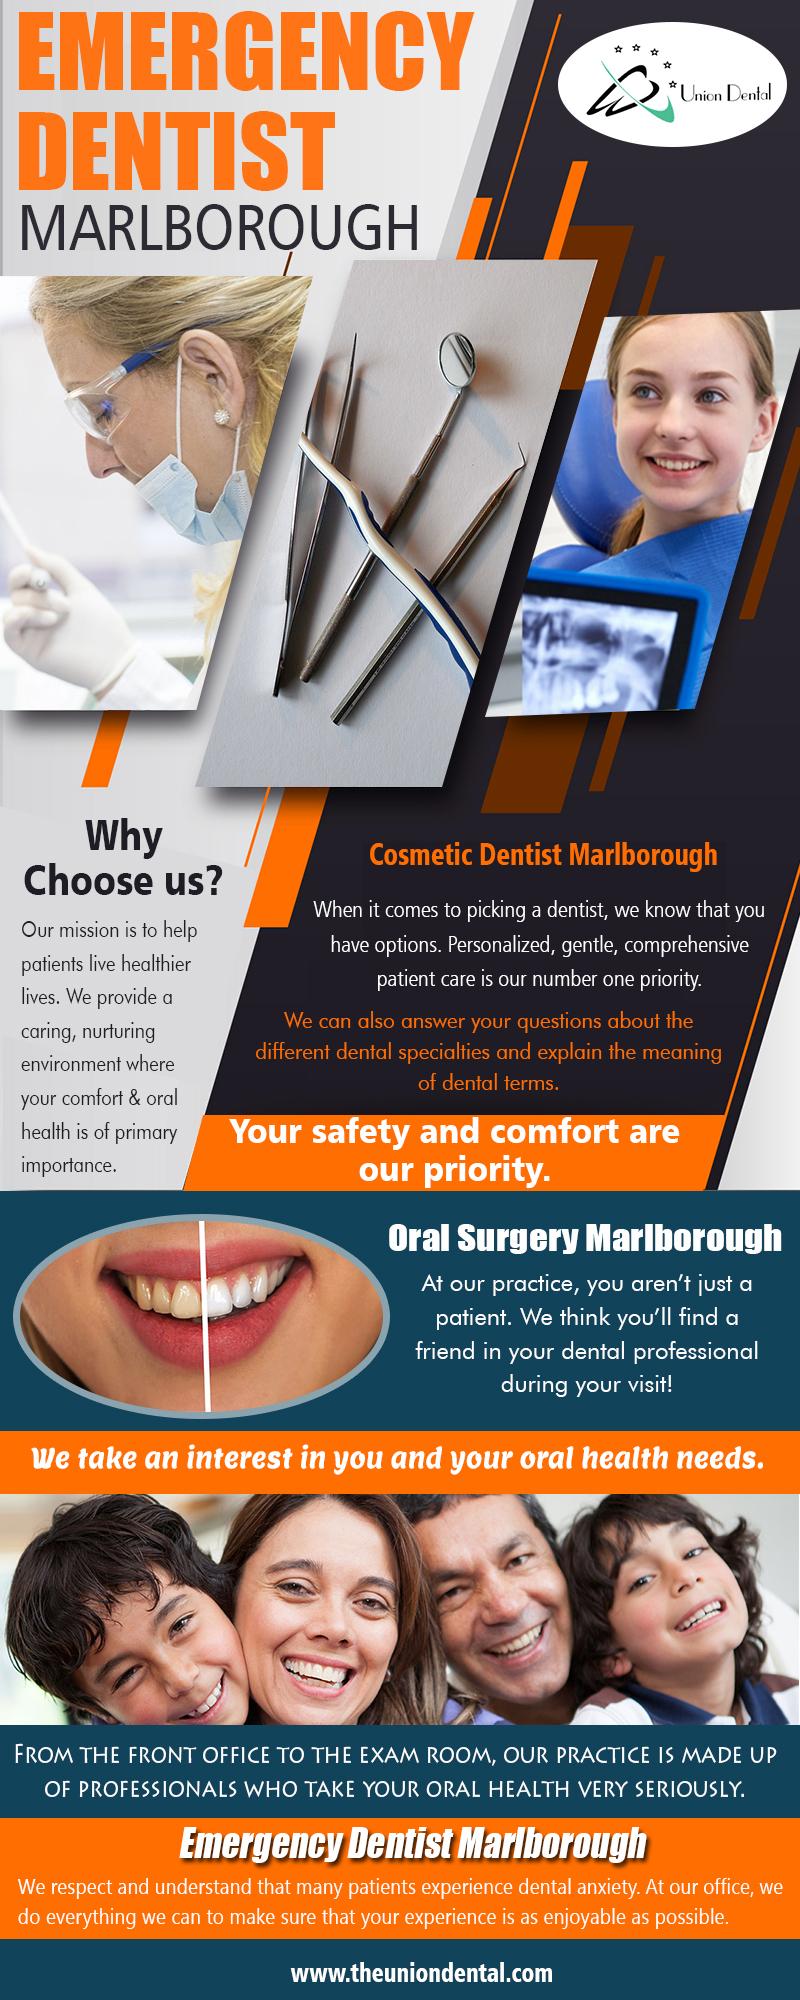 Emergency Dentist Marlborough